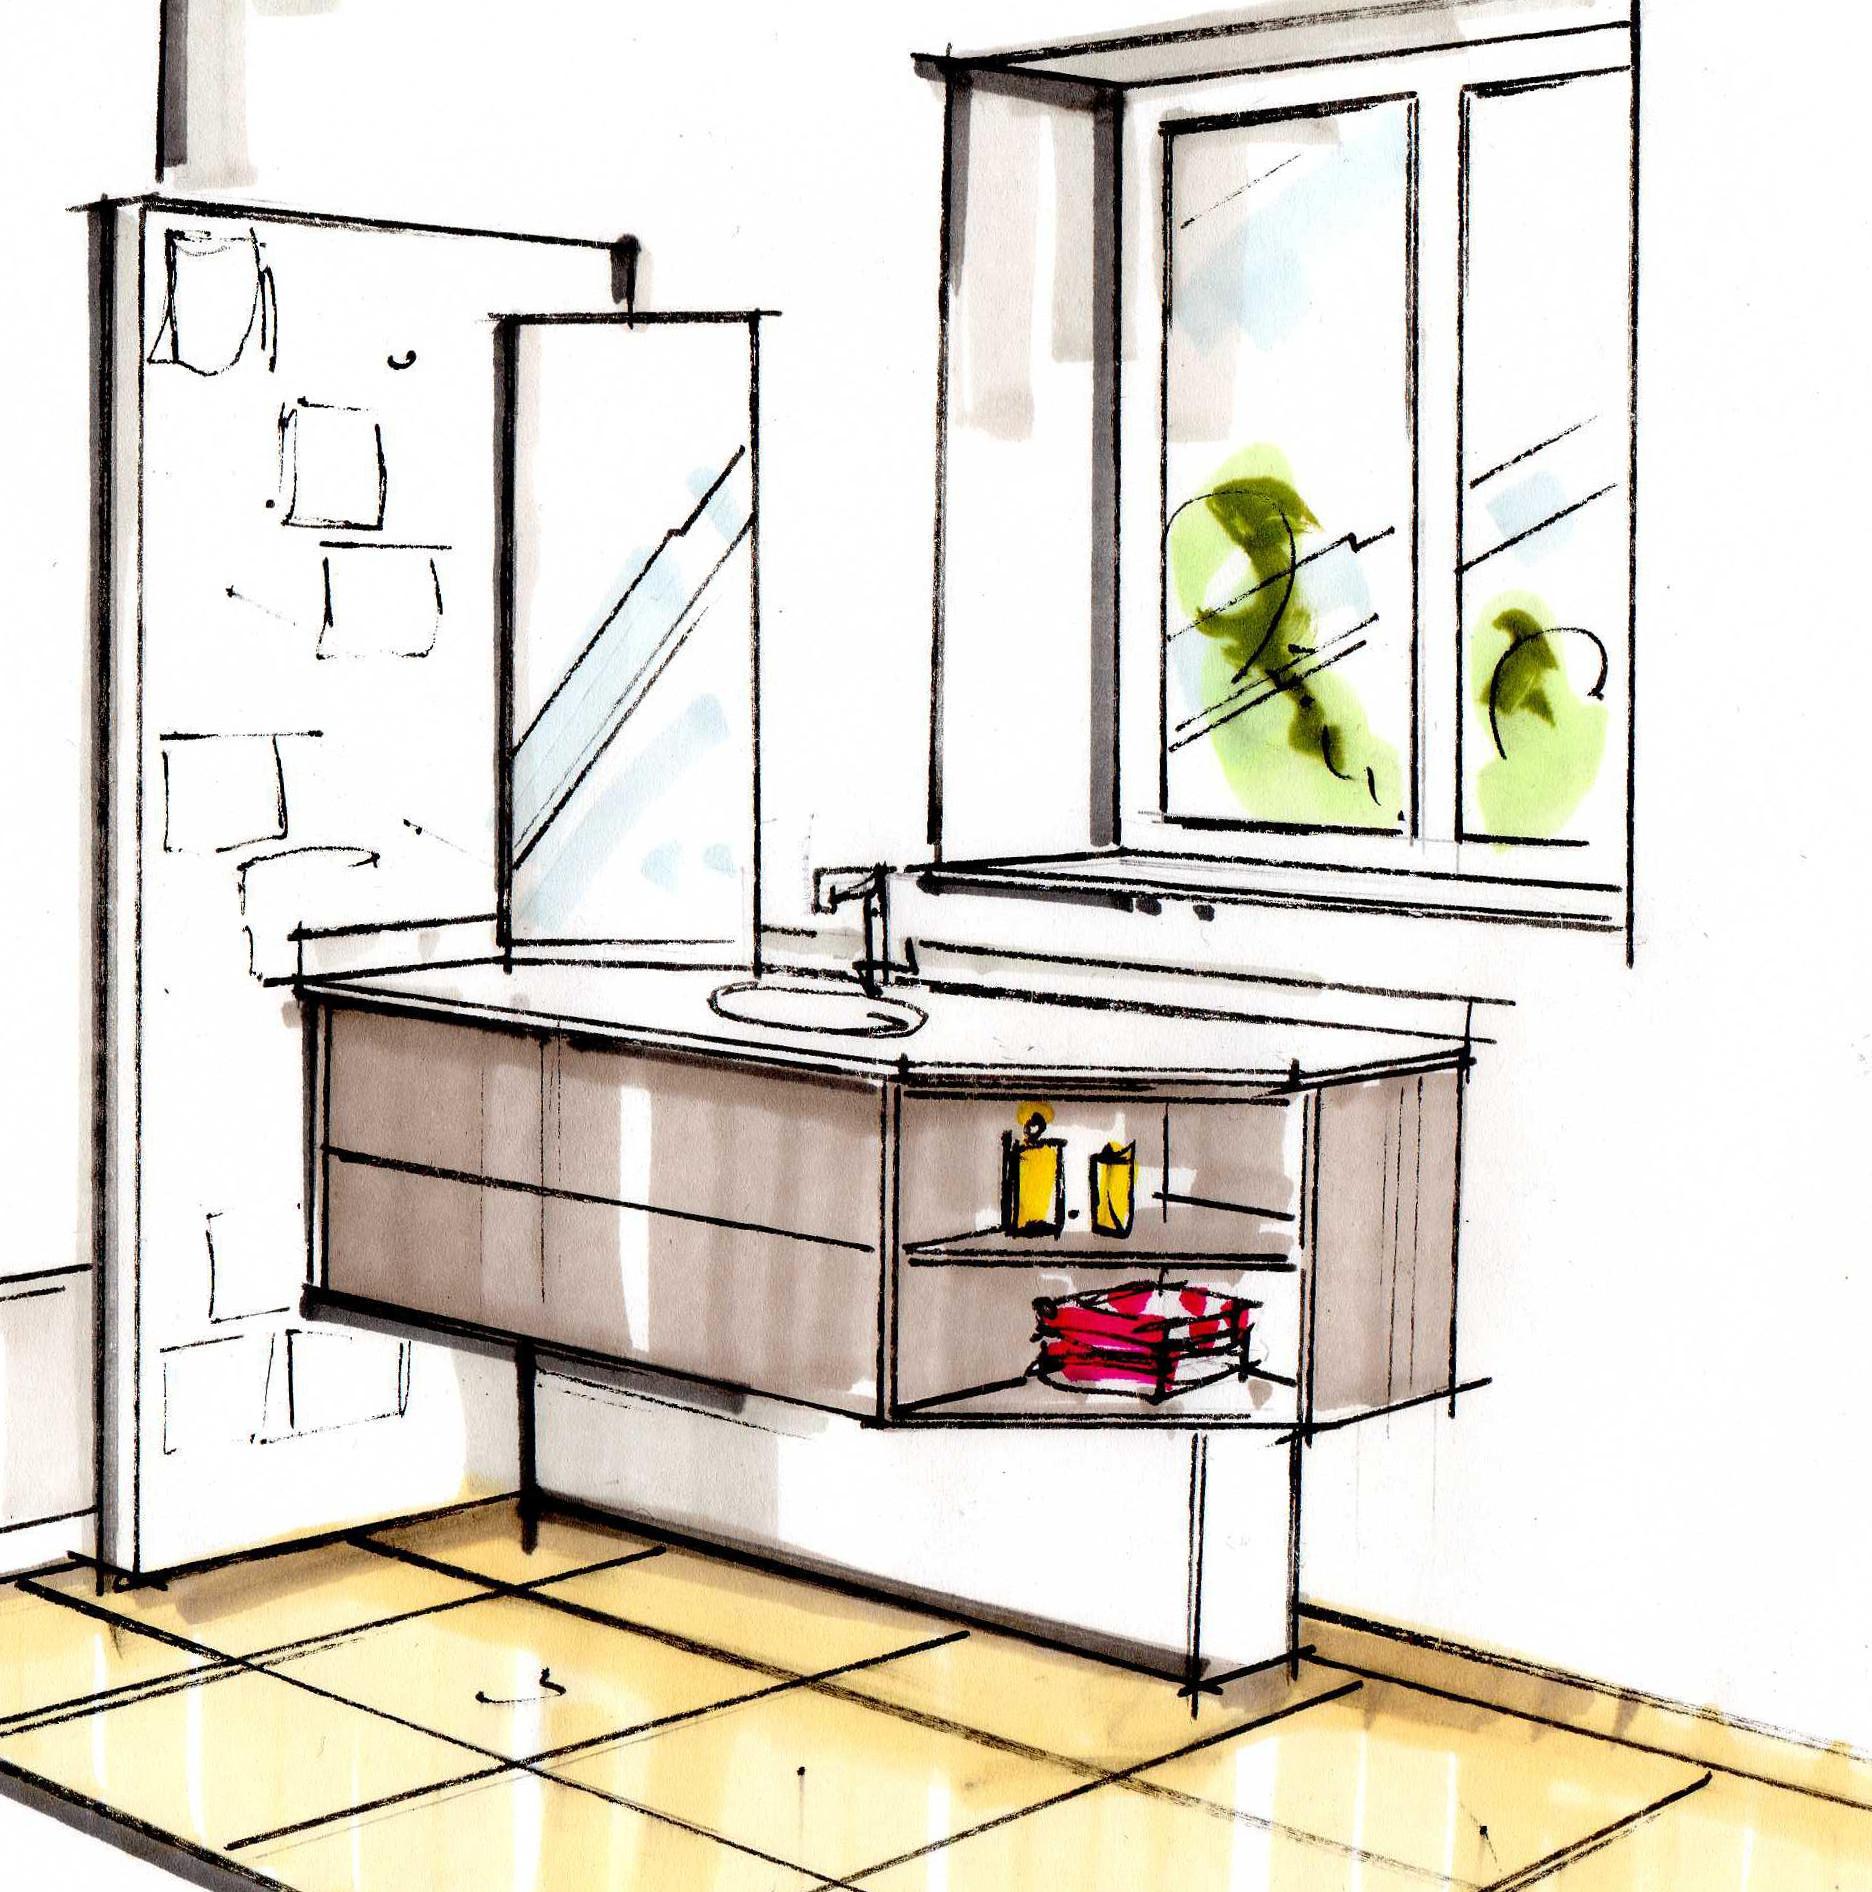 Salle de bain - Fabrication artisanale